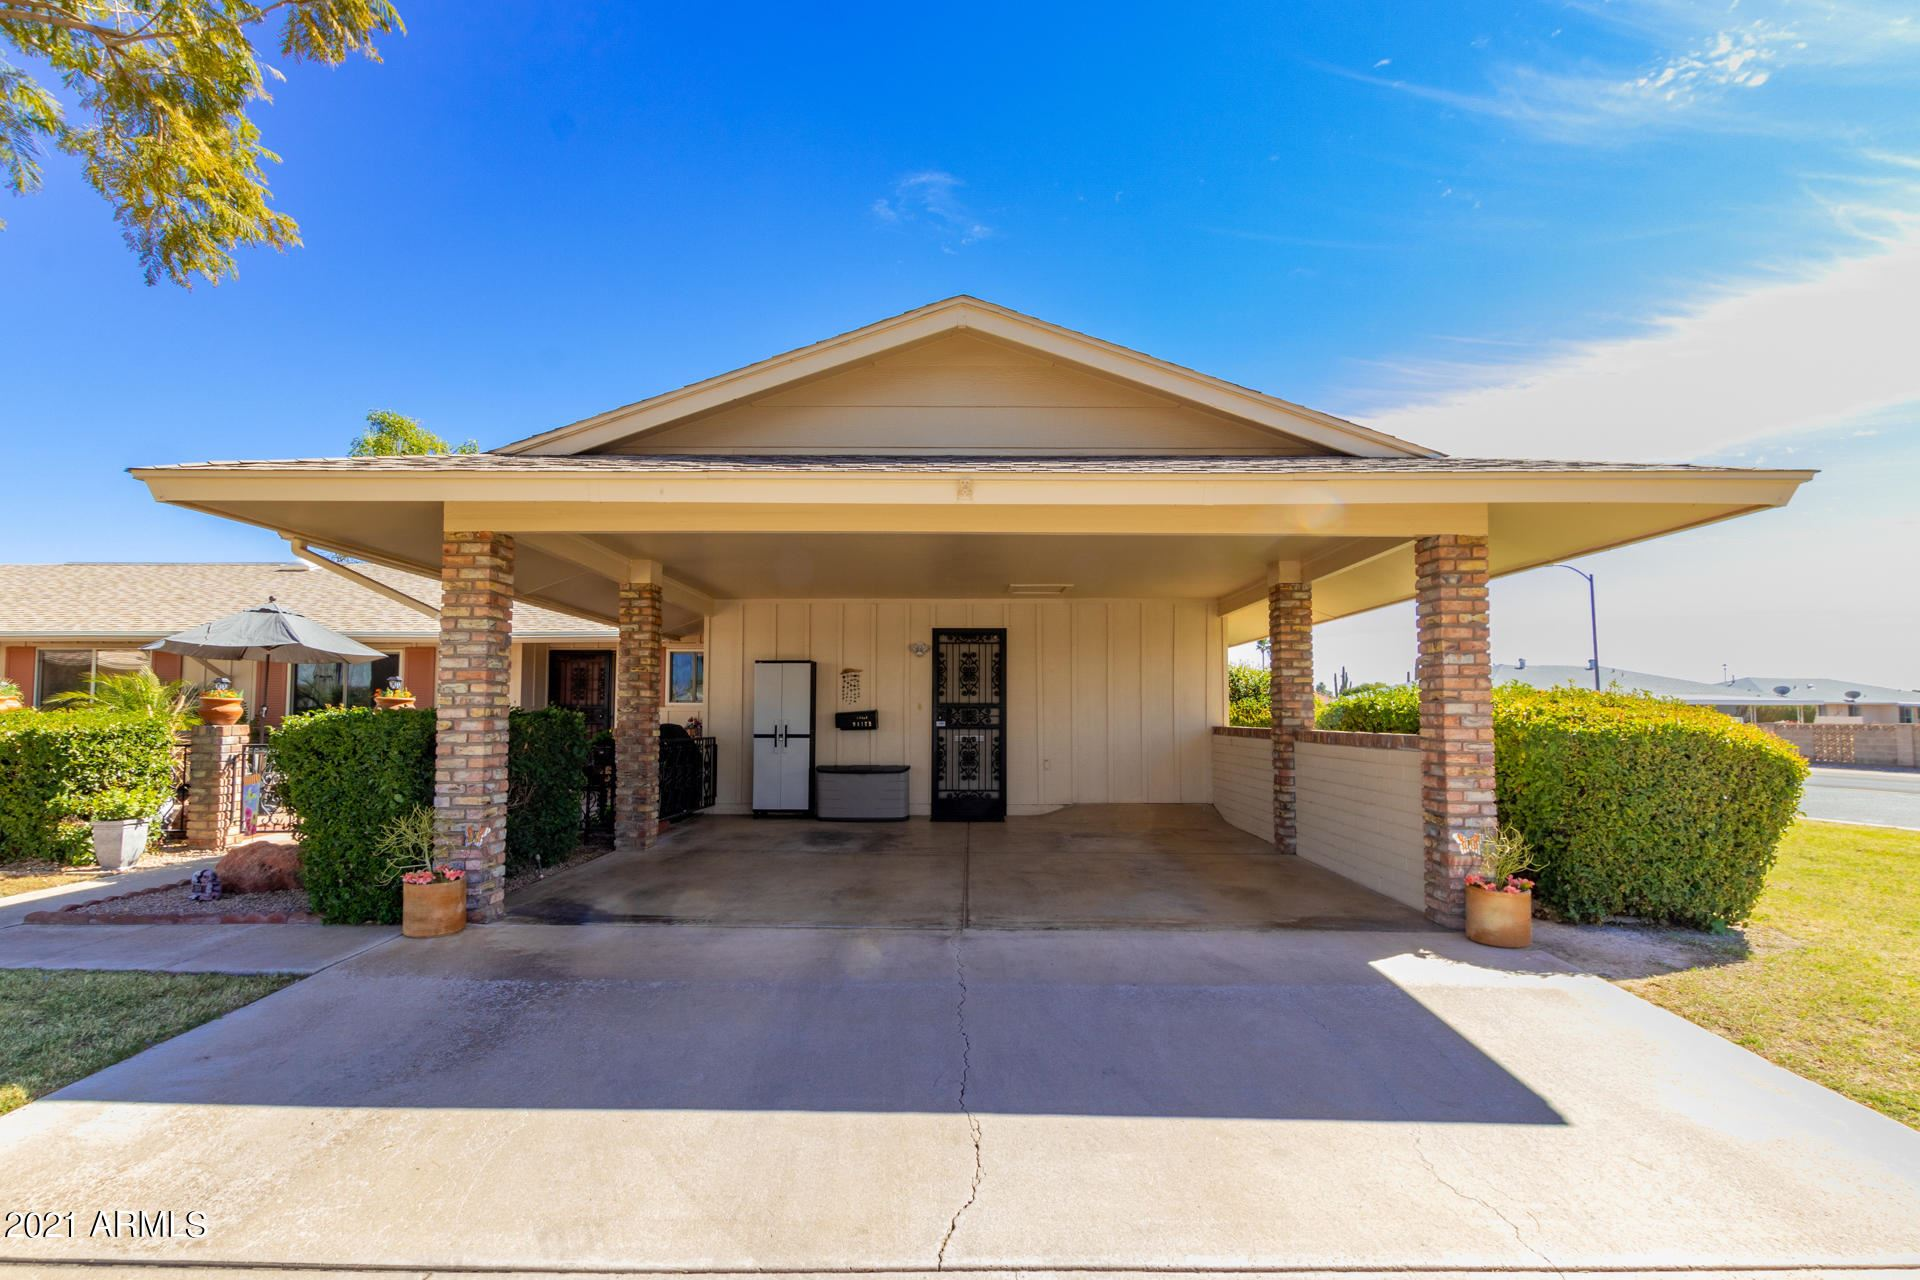 Photo of 10439 W KINGSWOOD Circle, Sun City, AZ 85351 (MLS # 6201634)